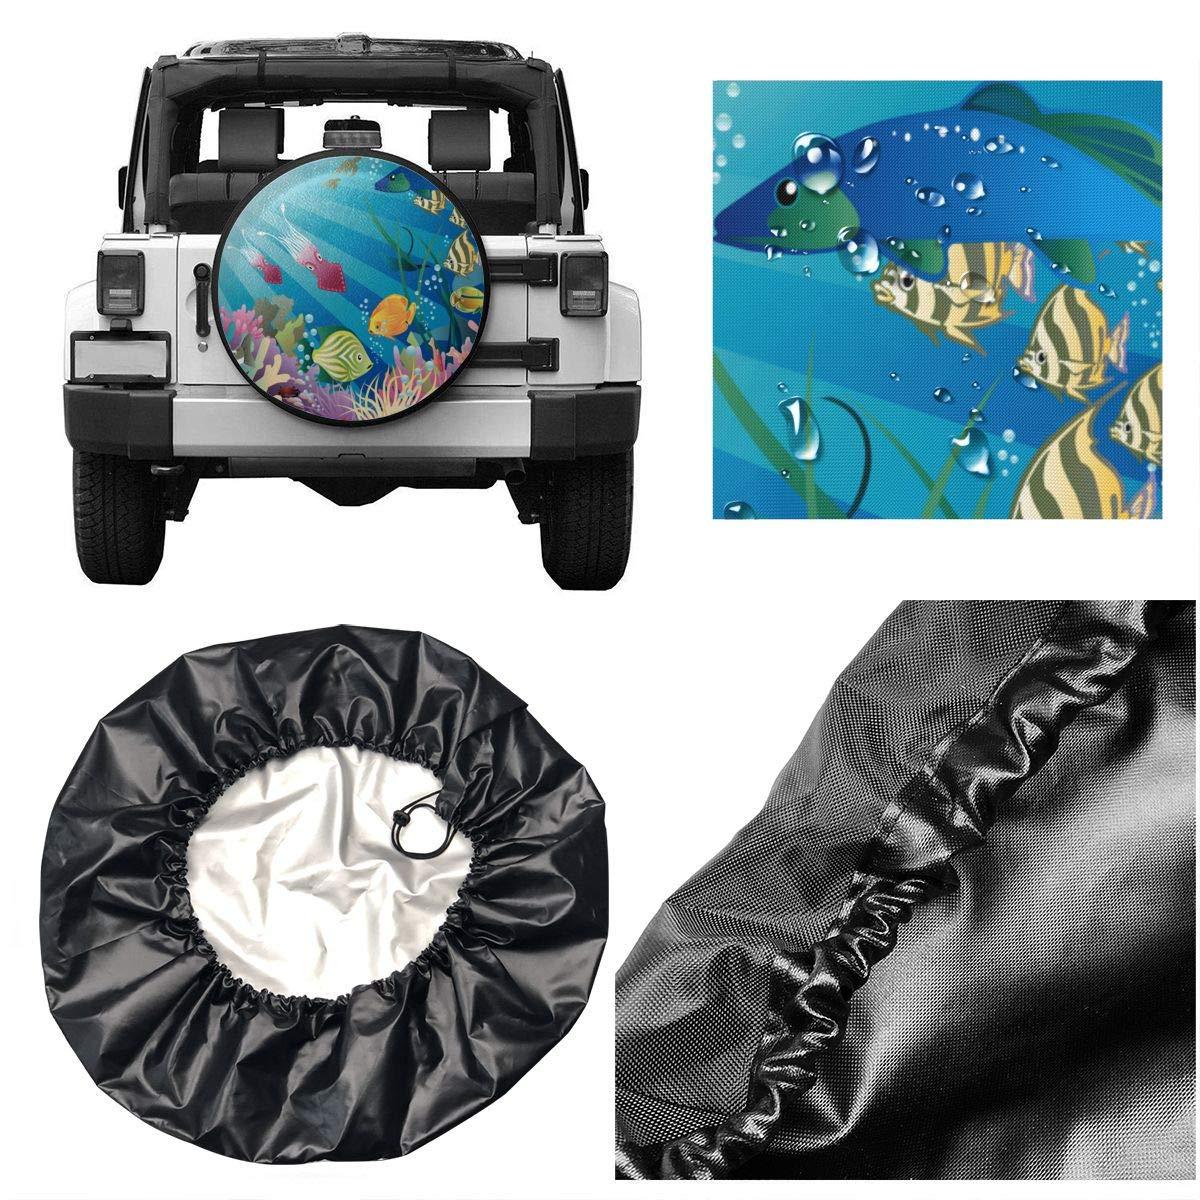 Pokuisnb Sunscreen Fish Tank Aquarium Alphabet Spare Tire Covers for All Cars 17 Inch by Pokuisnb (Image #5)